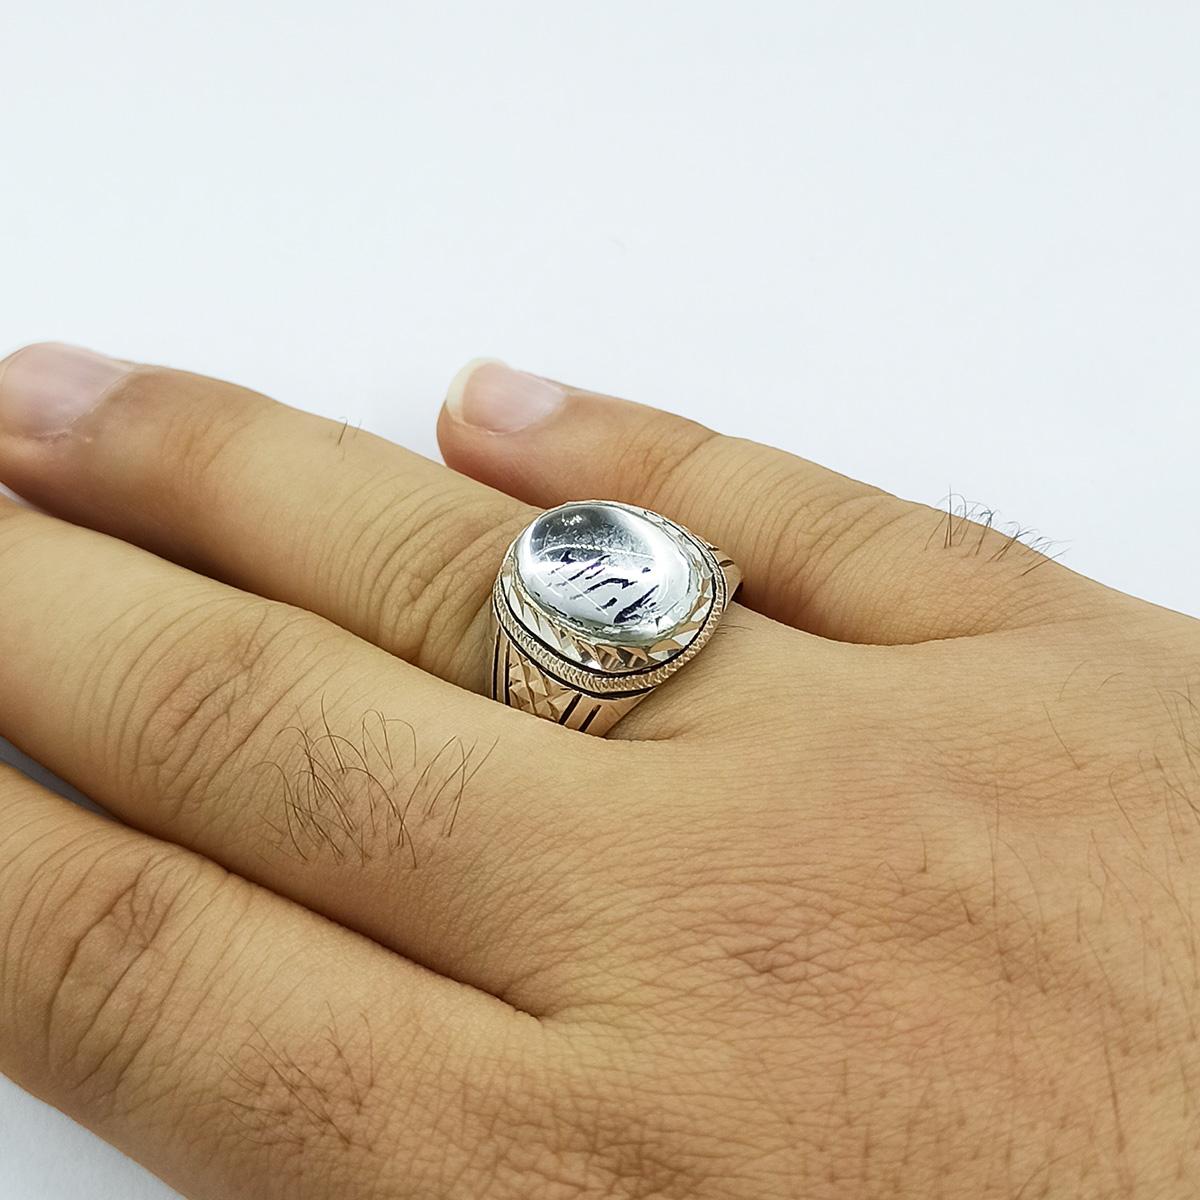 انگشتر نقره مردانه سلین کالا مدل دُر کد ce-As113